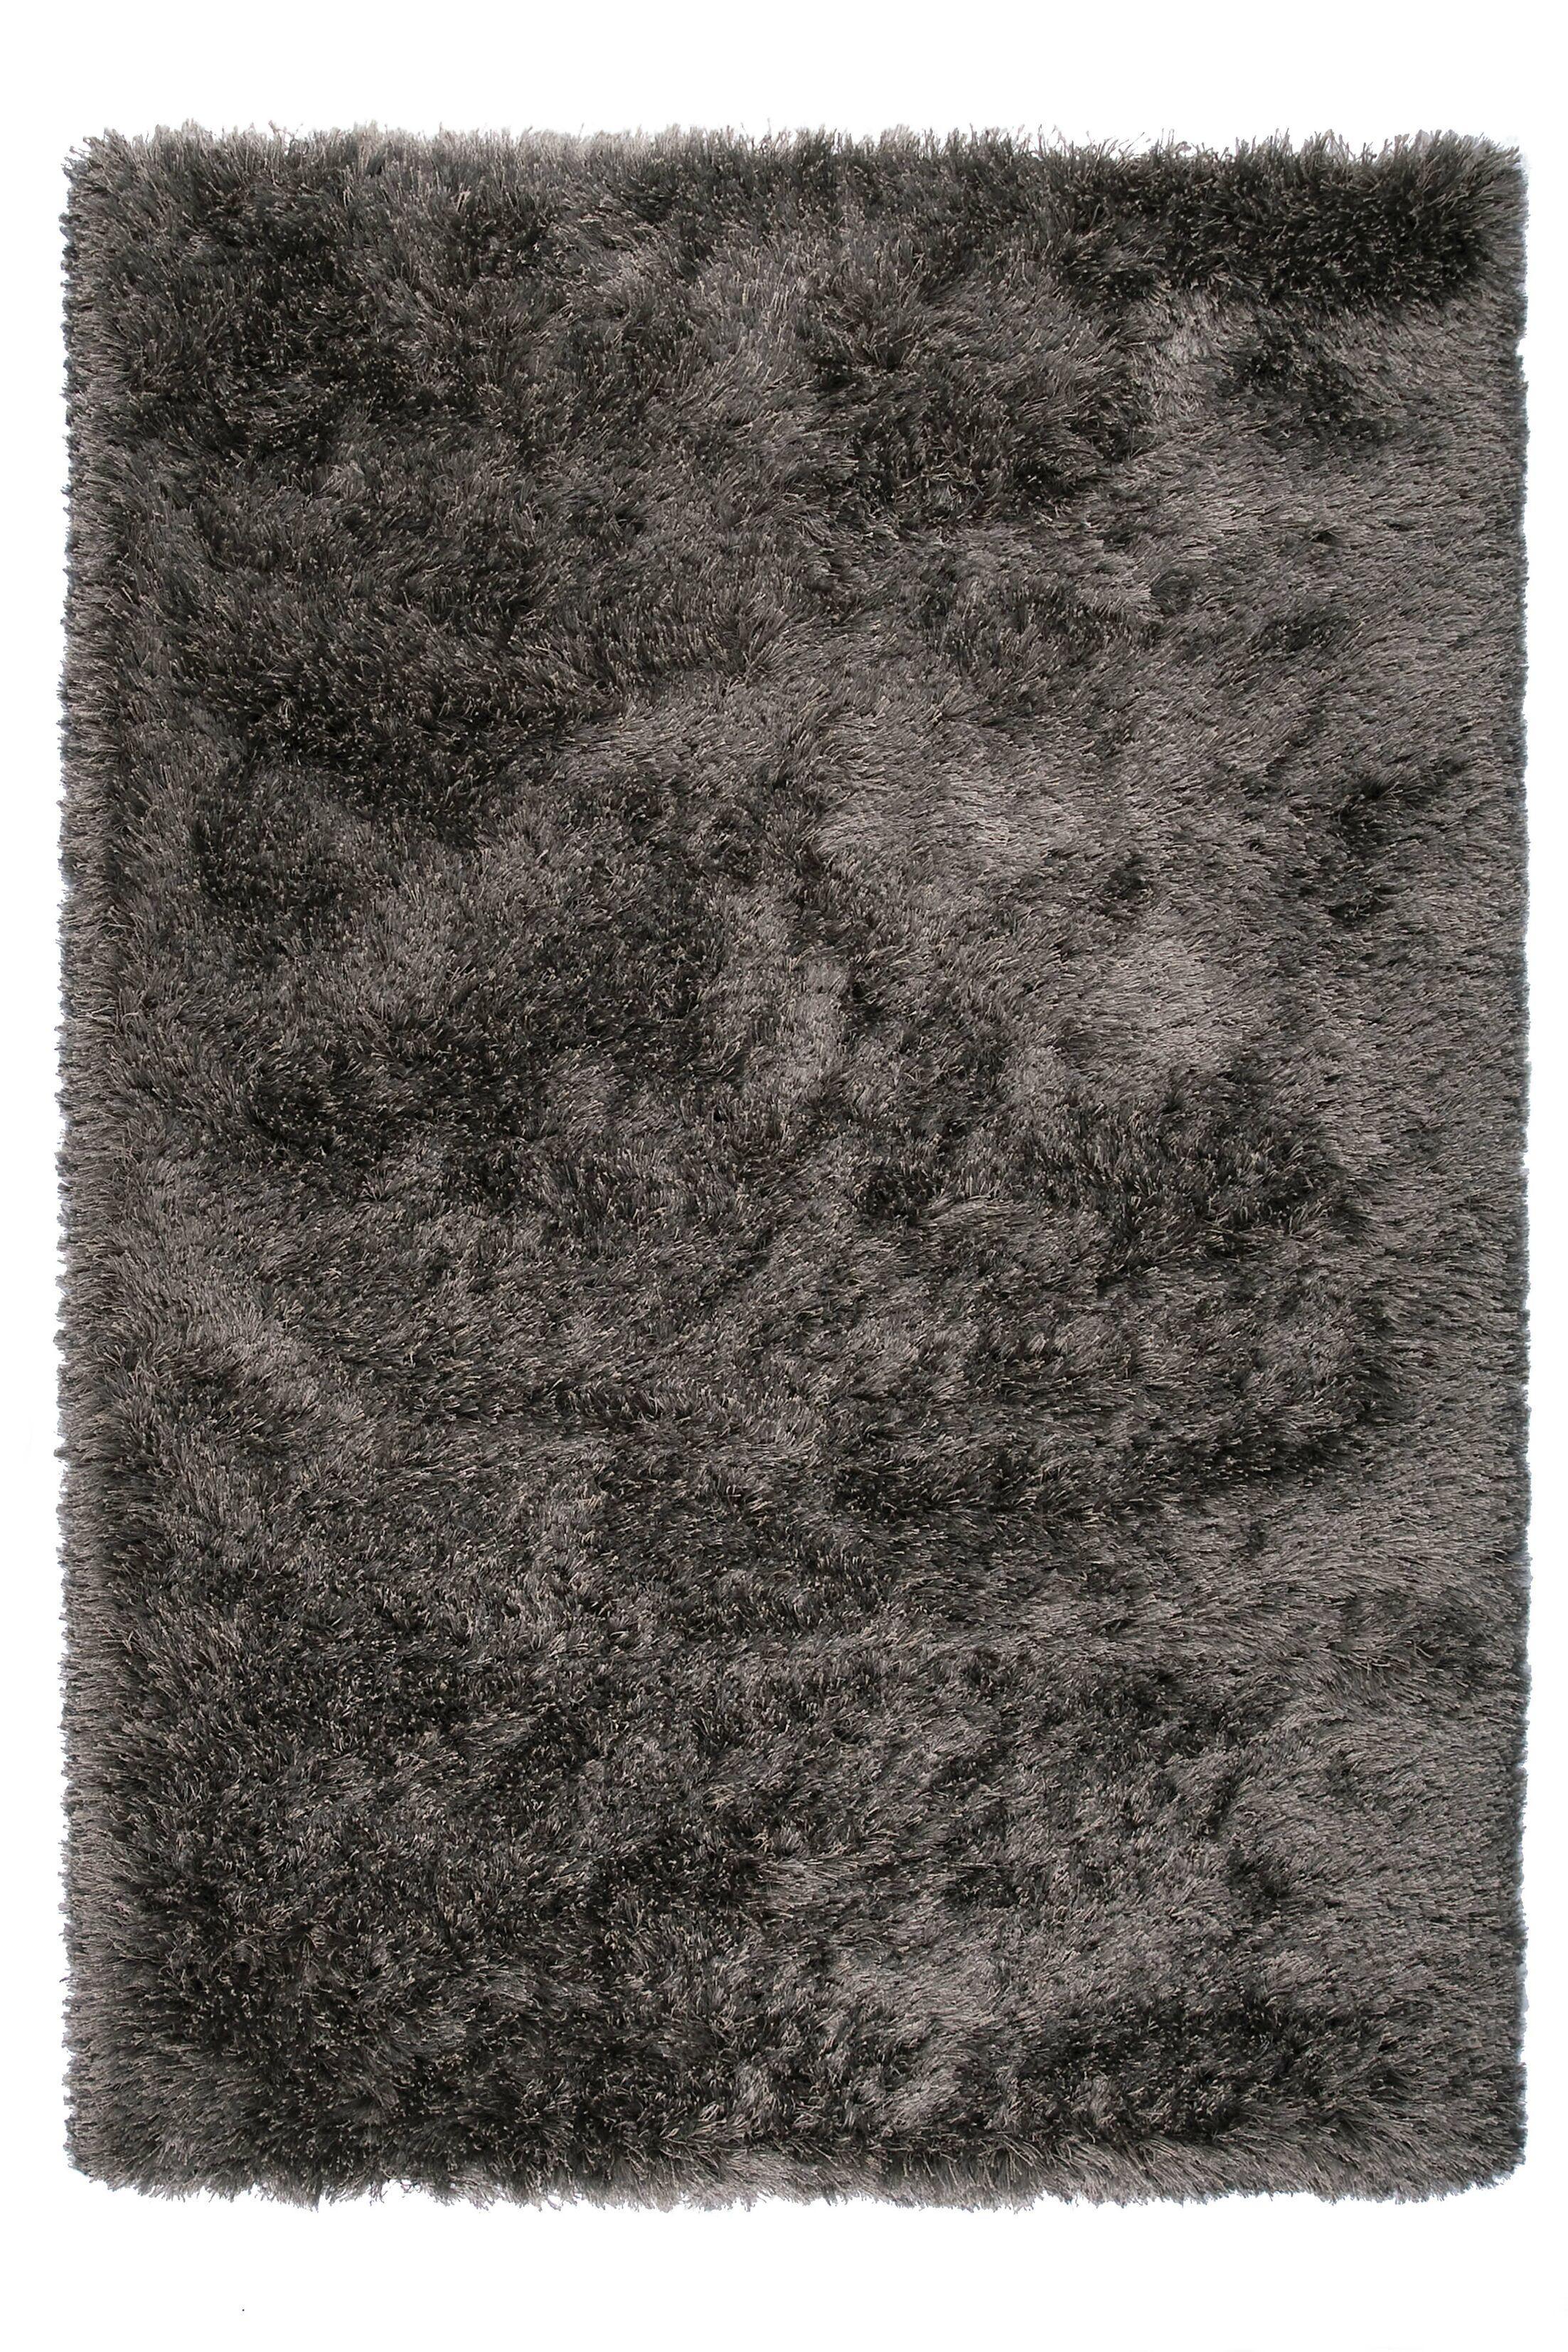 Silk Gray Area Rug Rug Size: 7'10